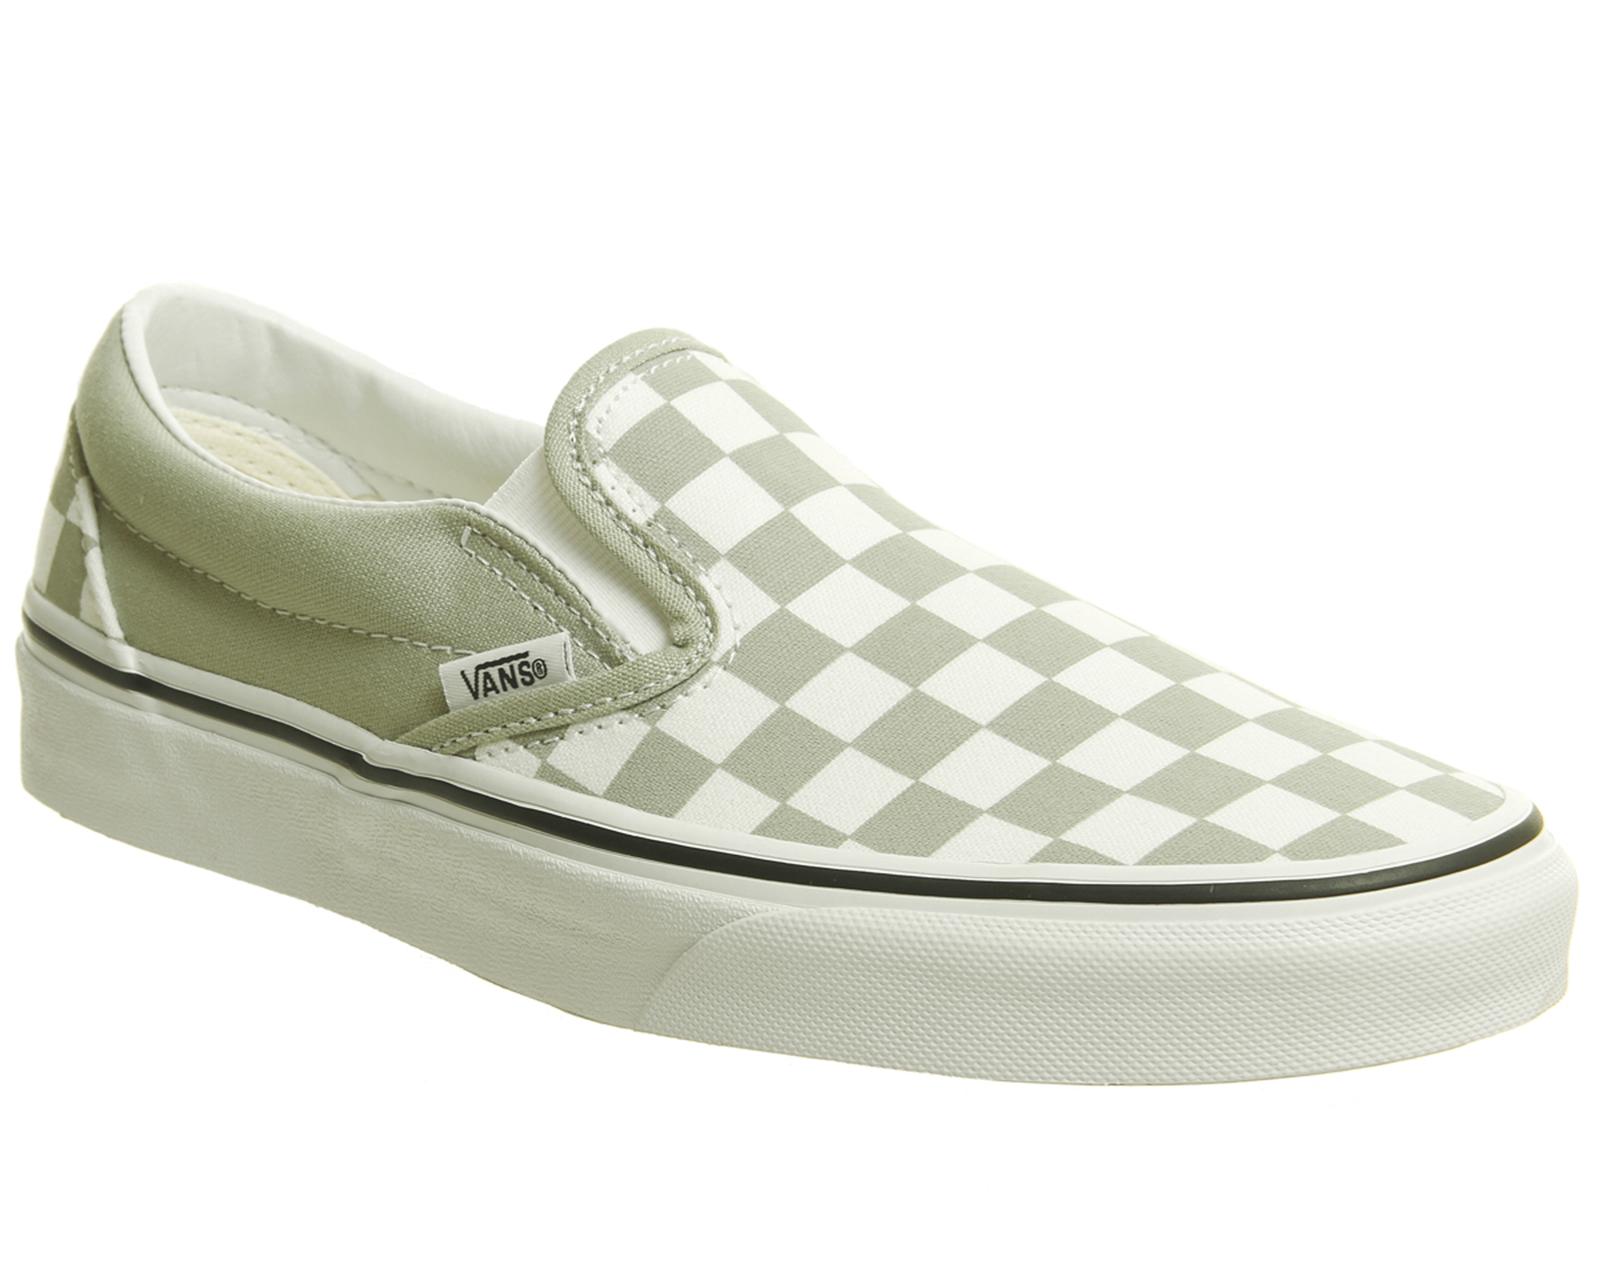 134cc311616a Sentinel Womens Vans Vans Classic Slip On Trainers Desert Sage True White  Trainers Shoes